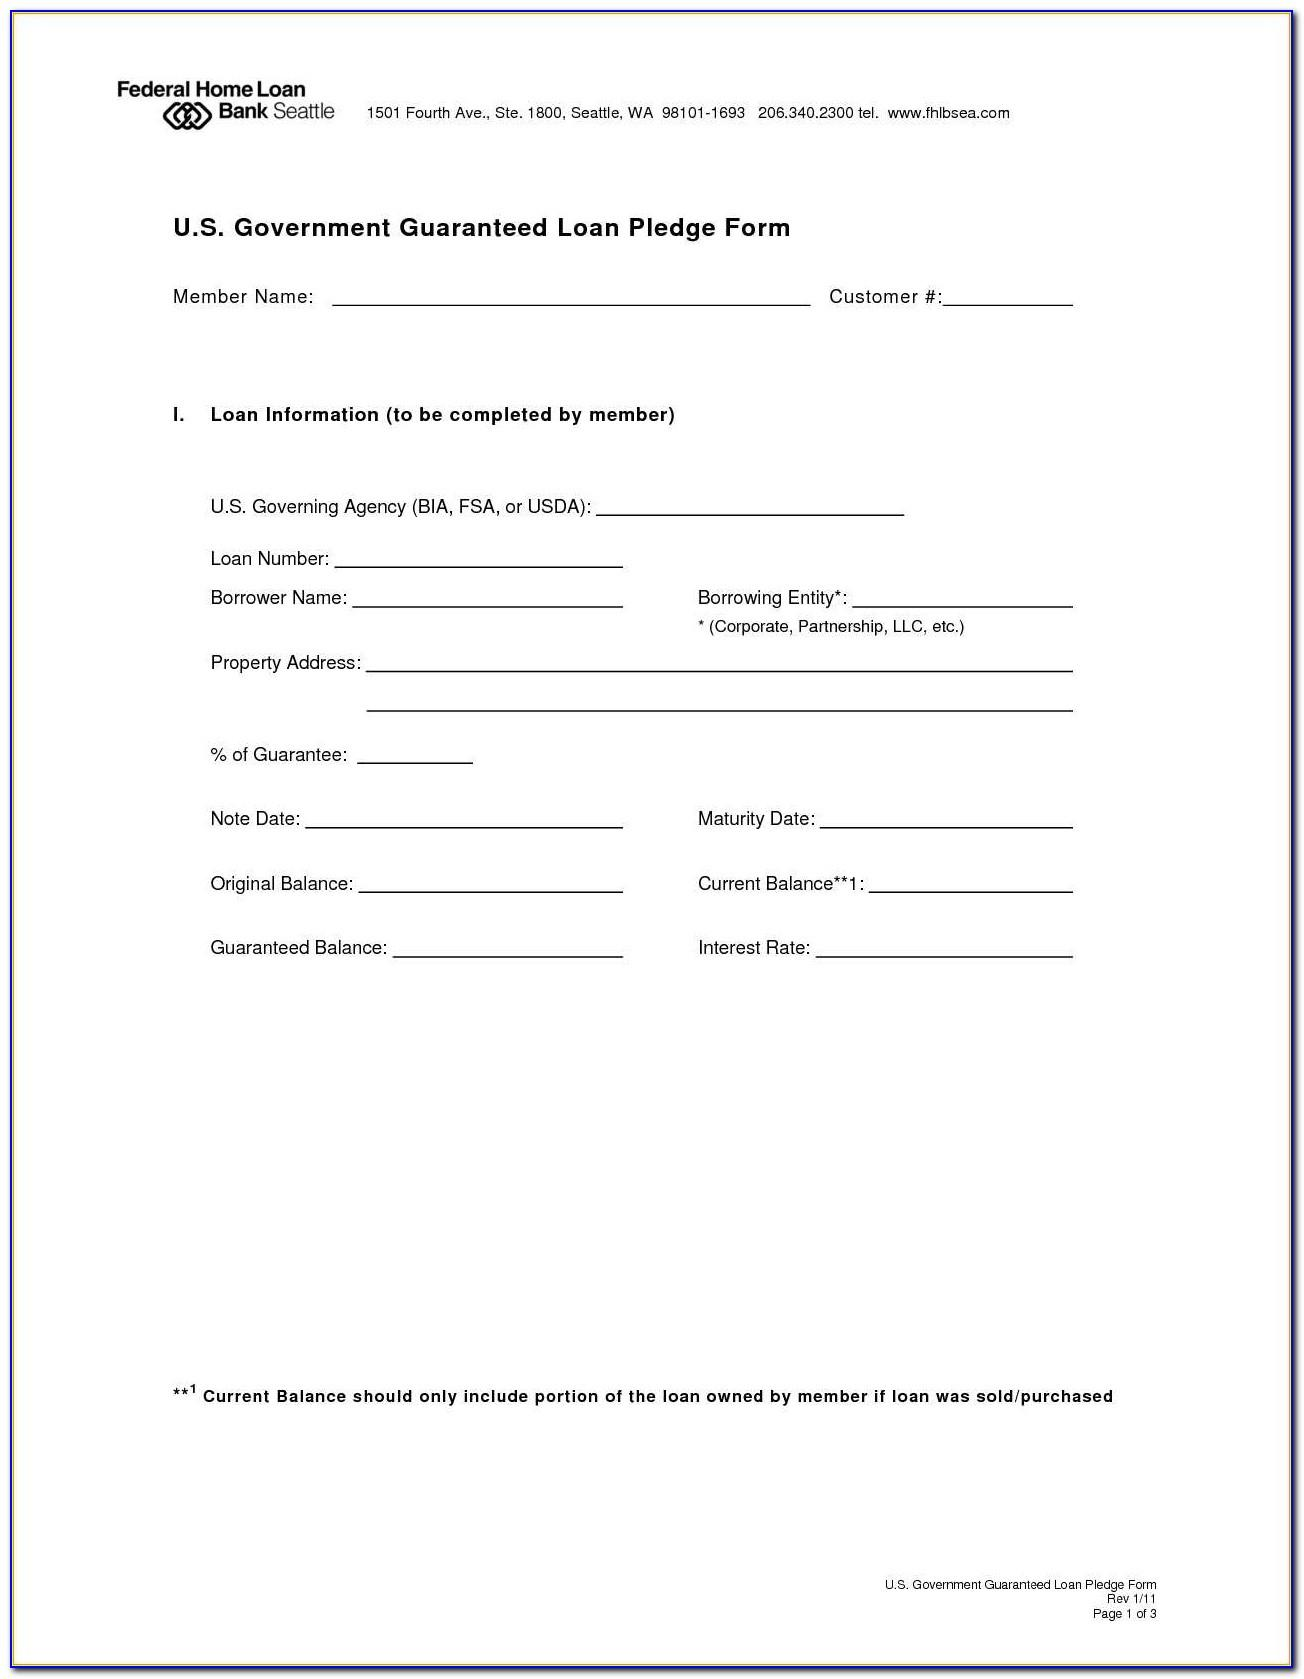 Legal Affidavit Forms Free